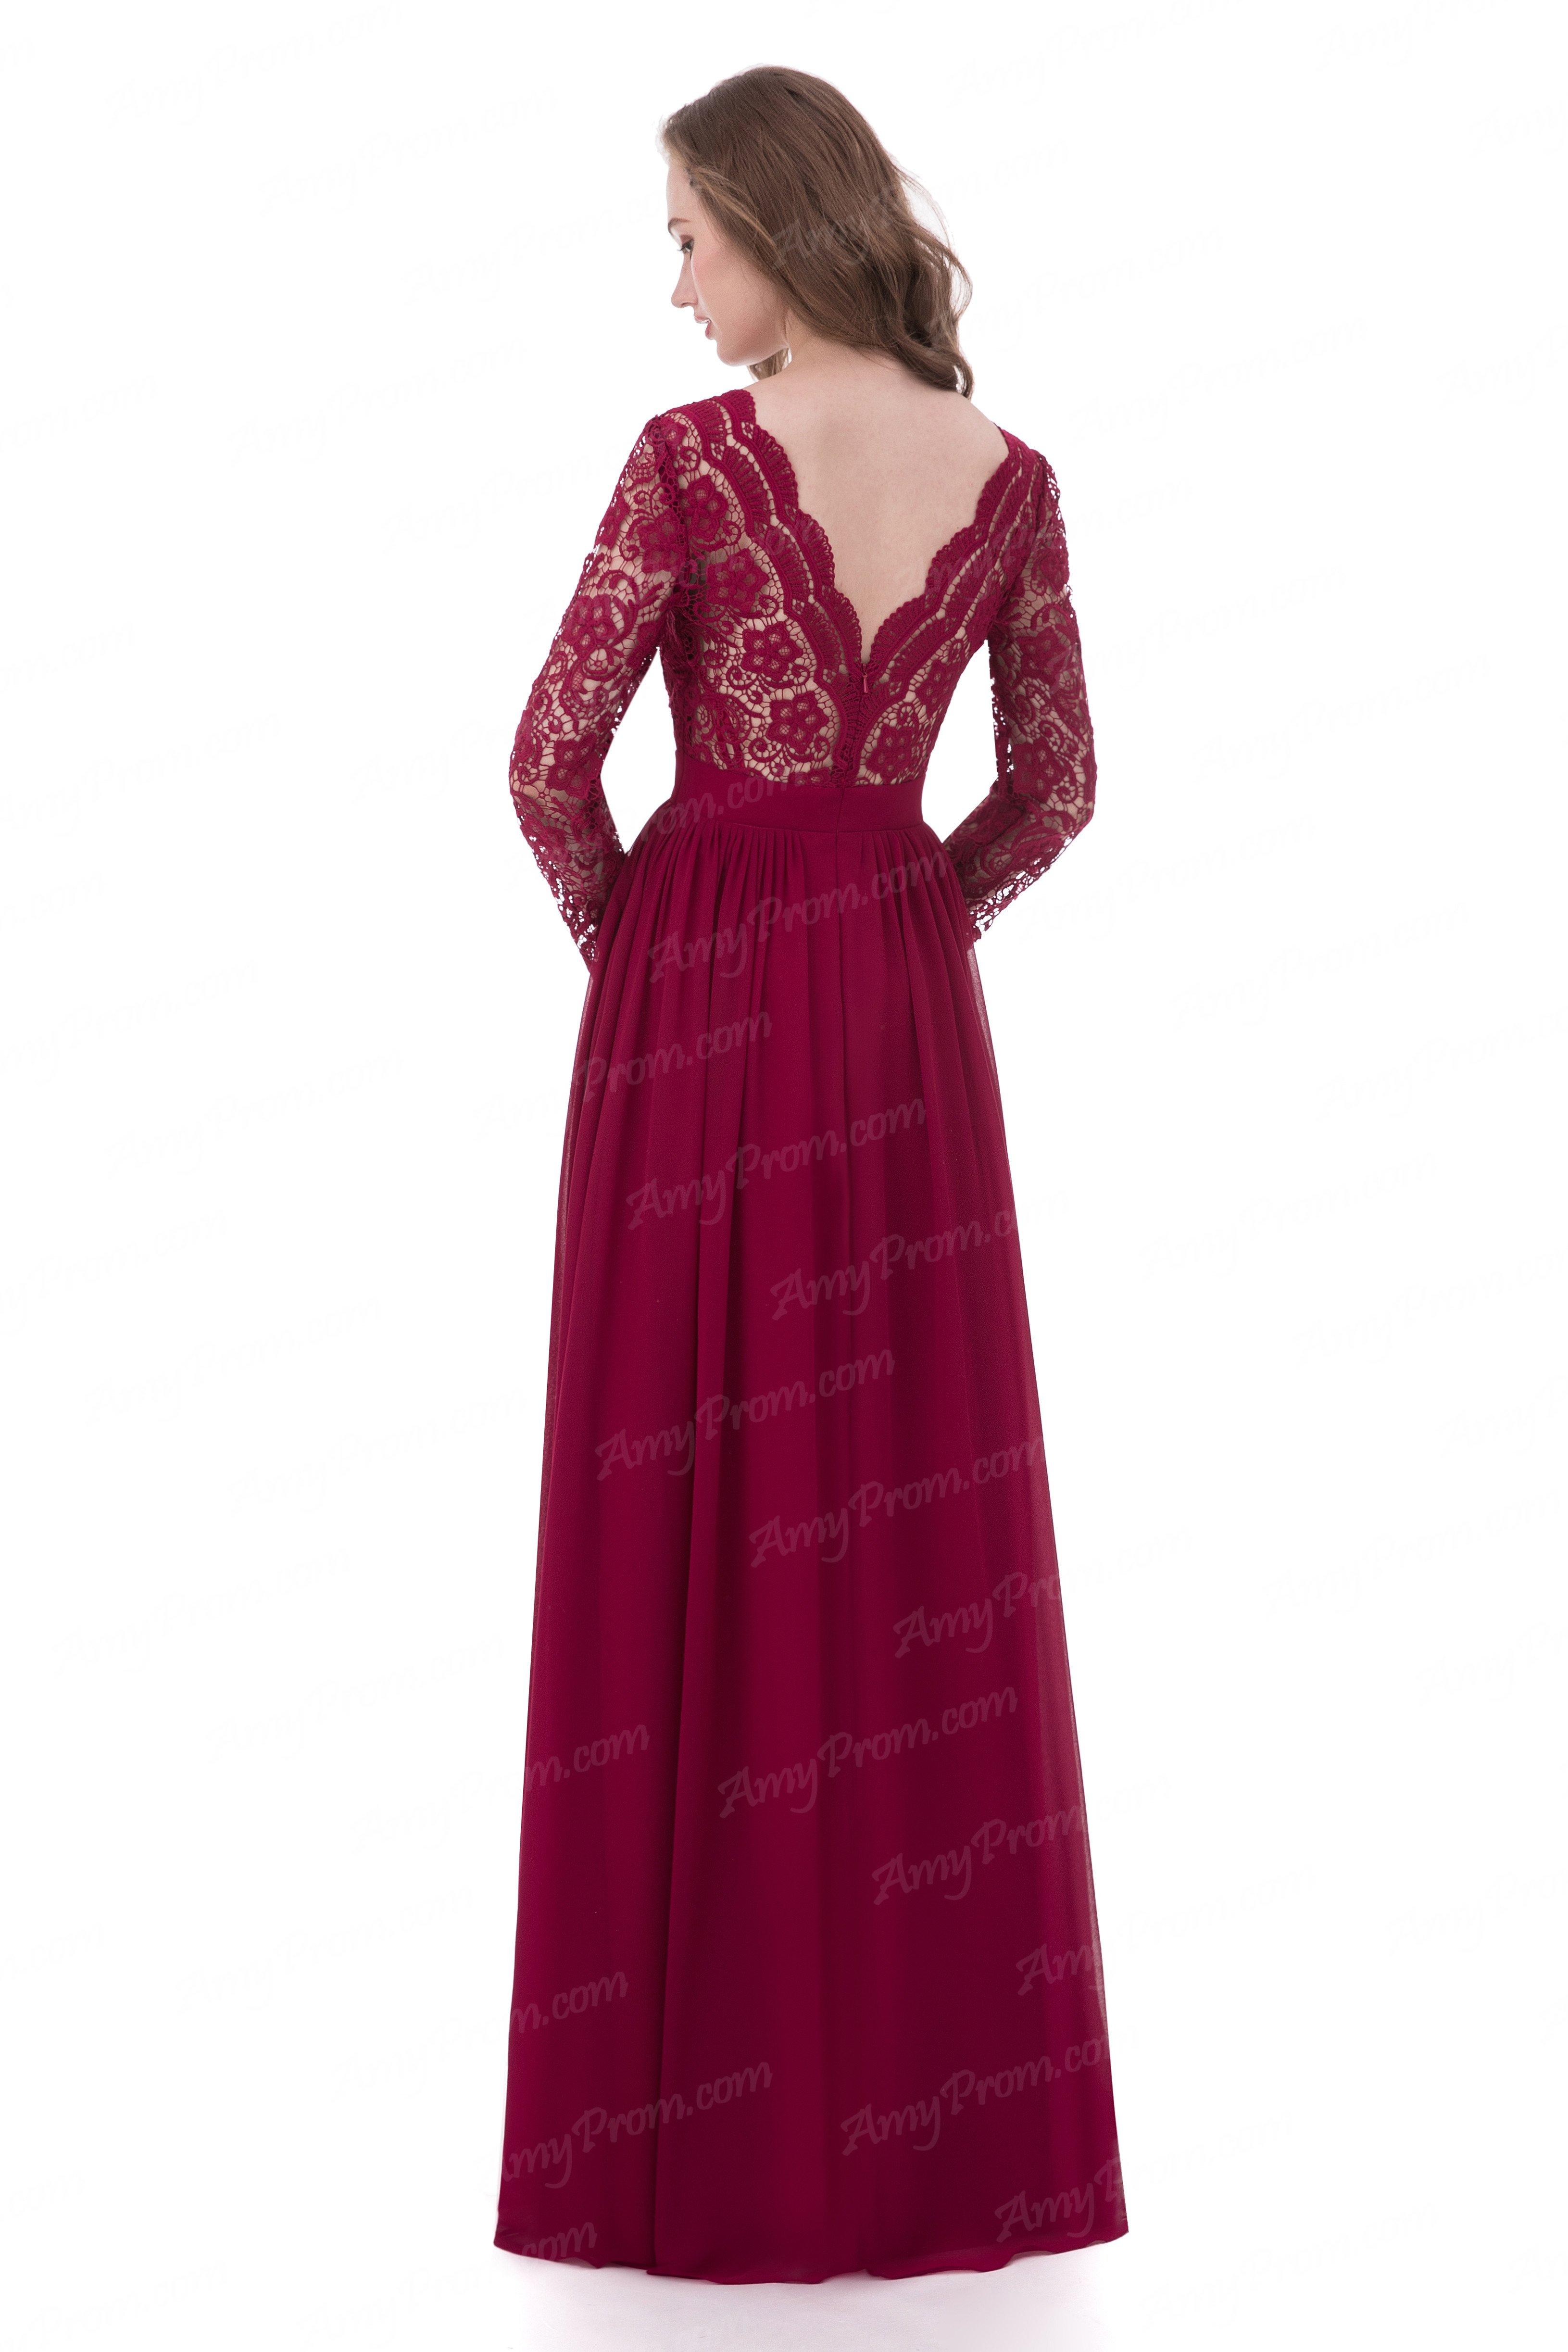 Burgundy Evening Dress b4b2622c9